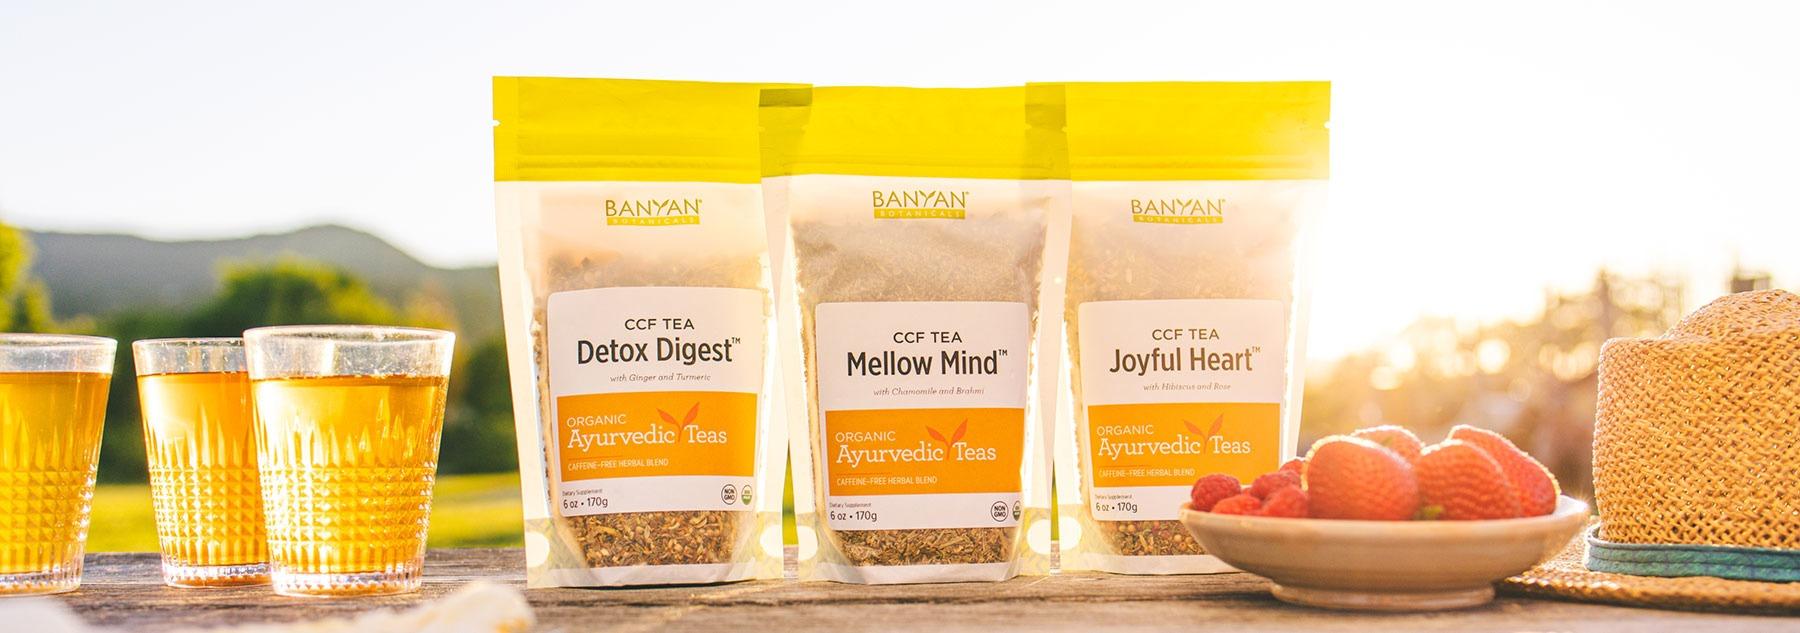 3 New CCF Tea Blends for Your Wellness Ritual